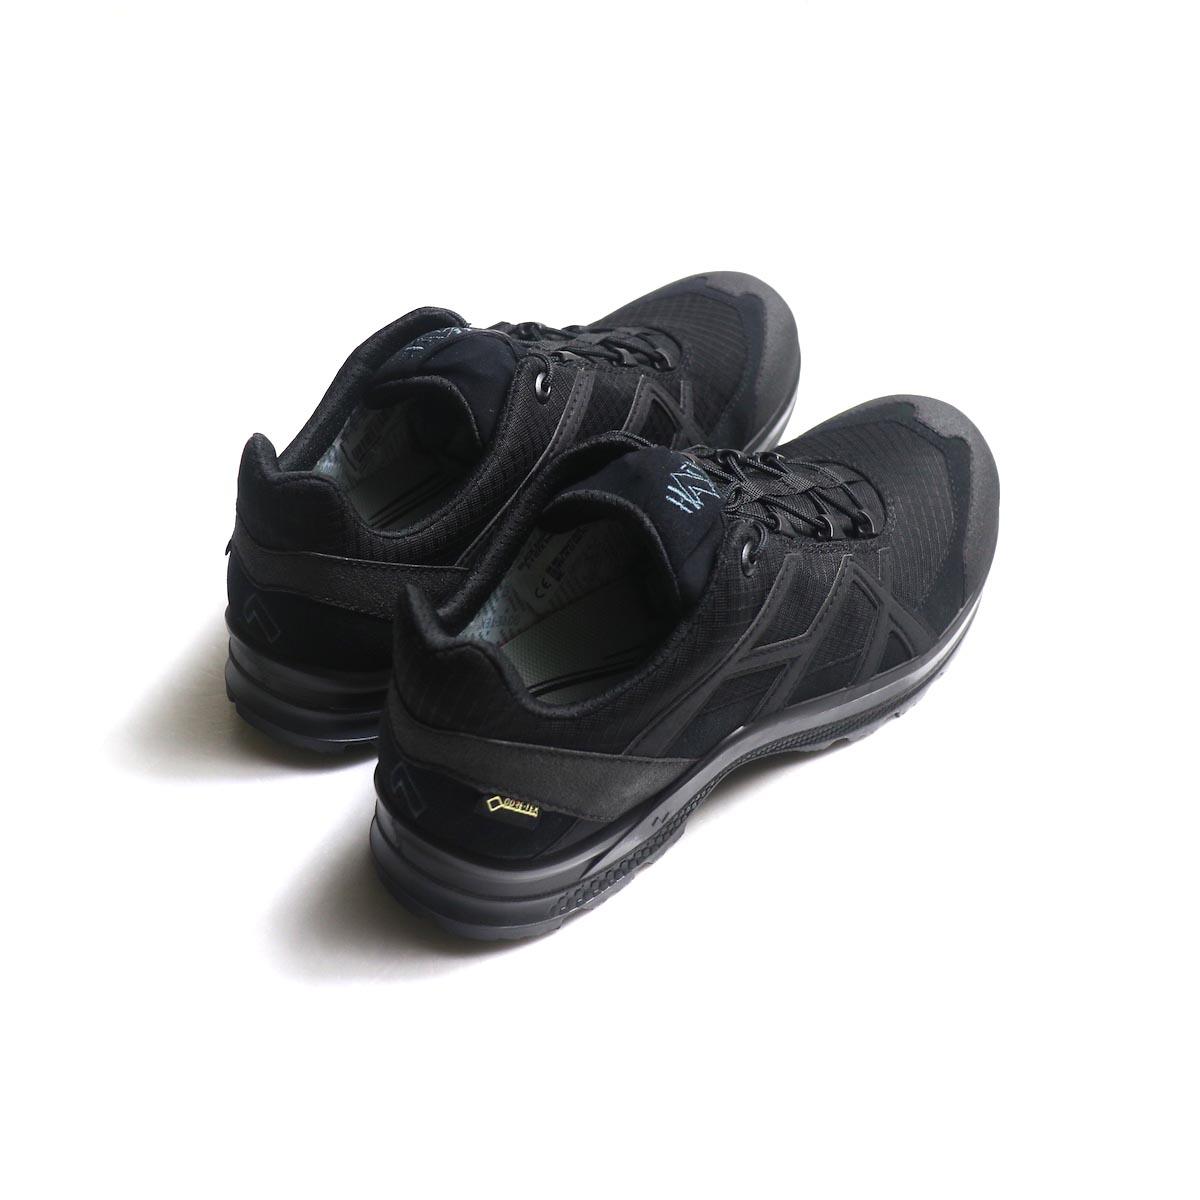 HAIX / BLACK EAGLE - ATHLETIC 2.1 GTX LOW (Black)背面